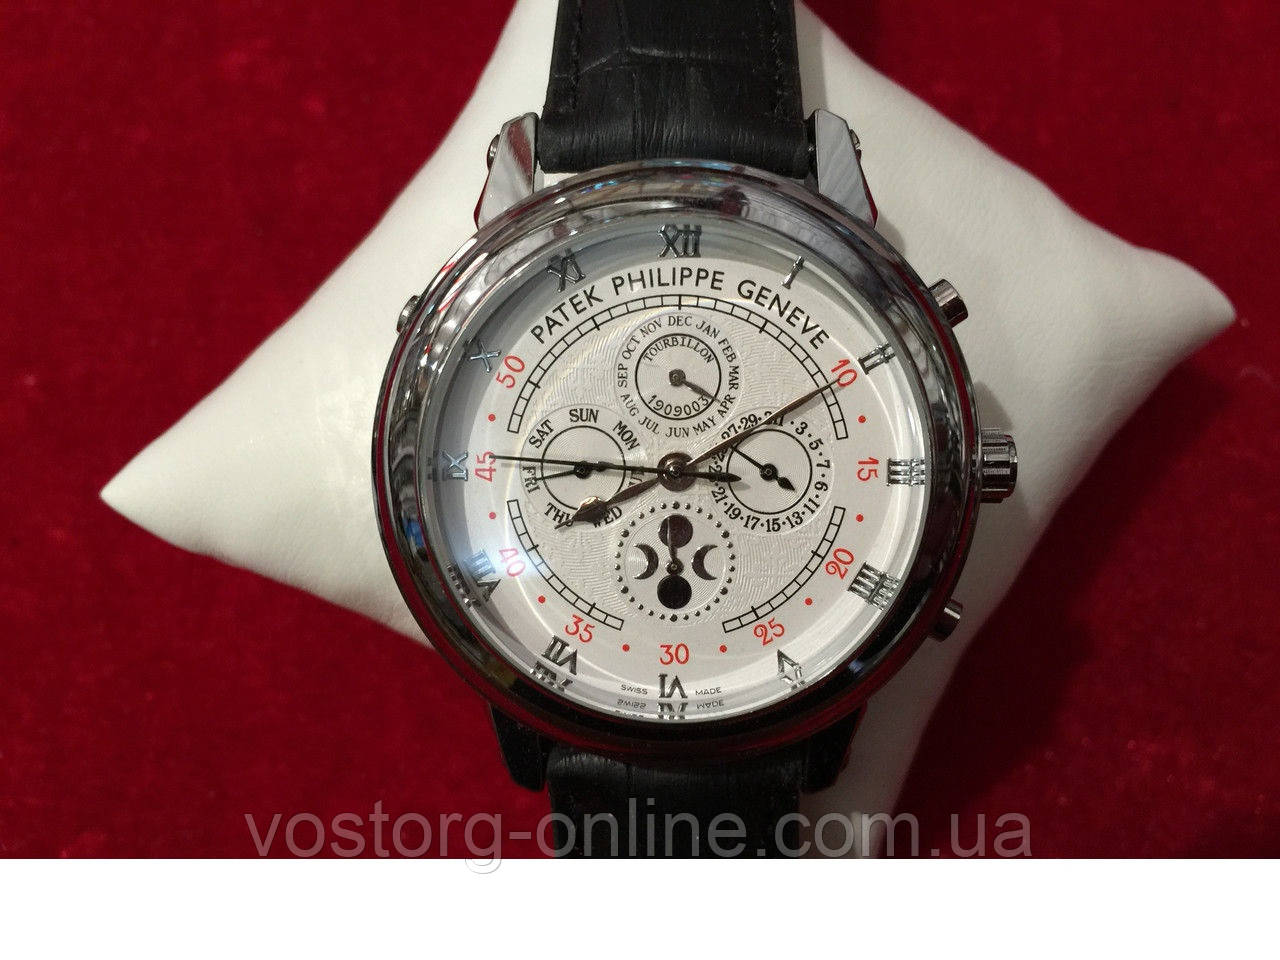 8f40dc2c ЧАСЫ PATEK PHILIPPE SKY MOON TOURBILLON , женские часы, механические часы, наручные  часы,